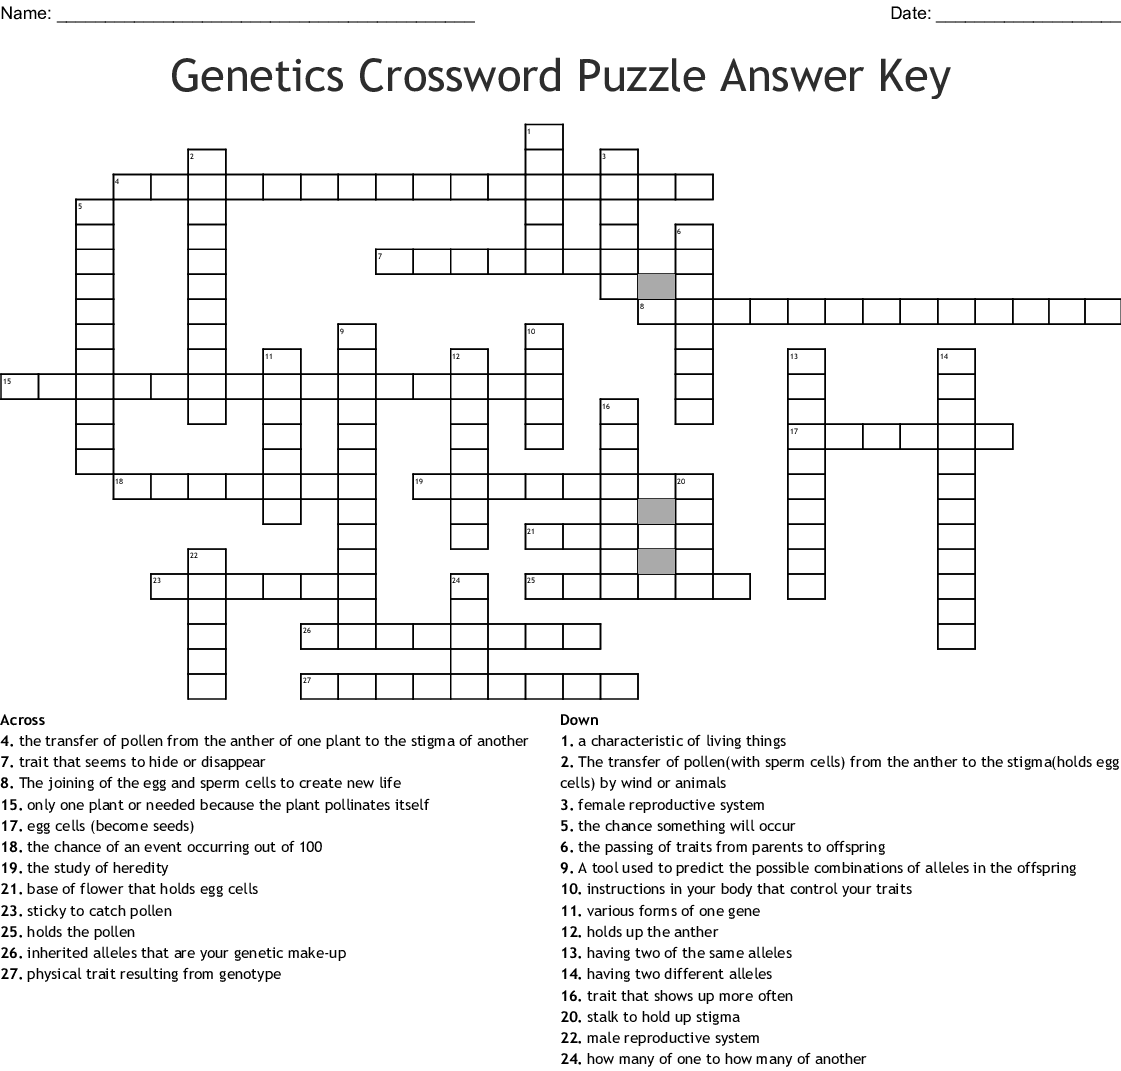 Genetics Crossword Puzzle Answer Key Crossword